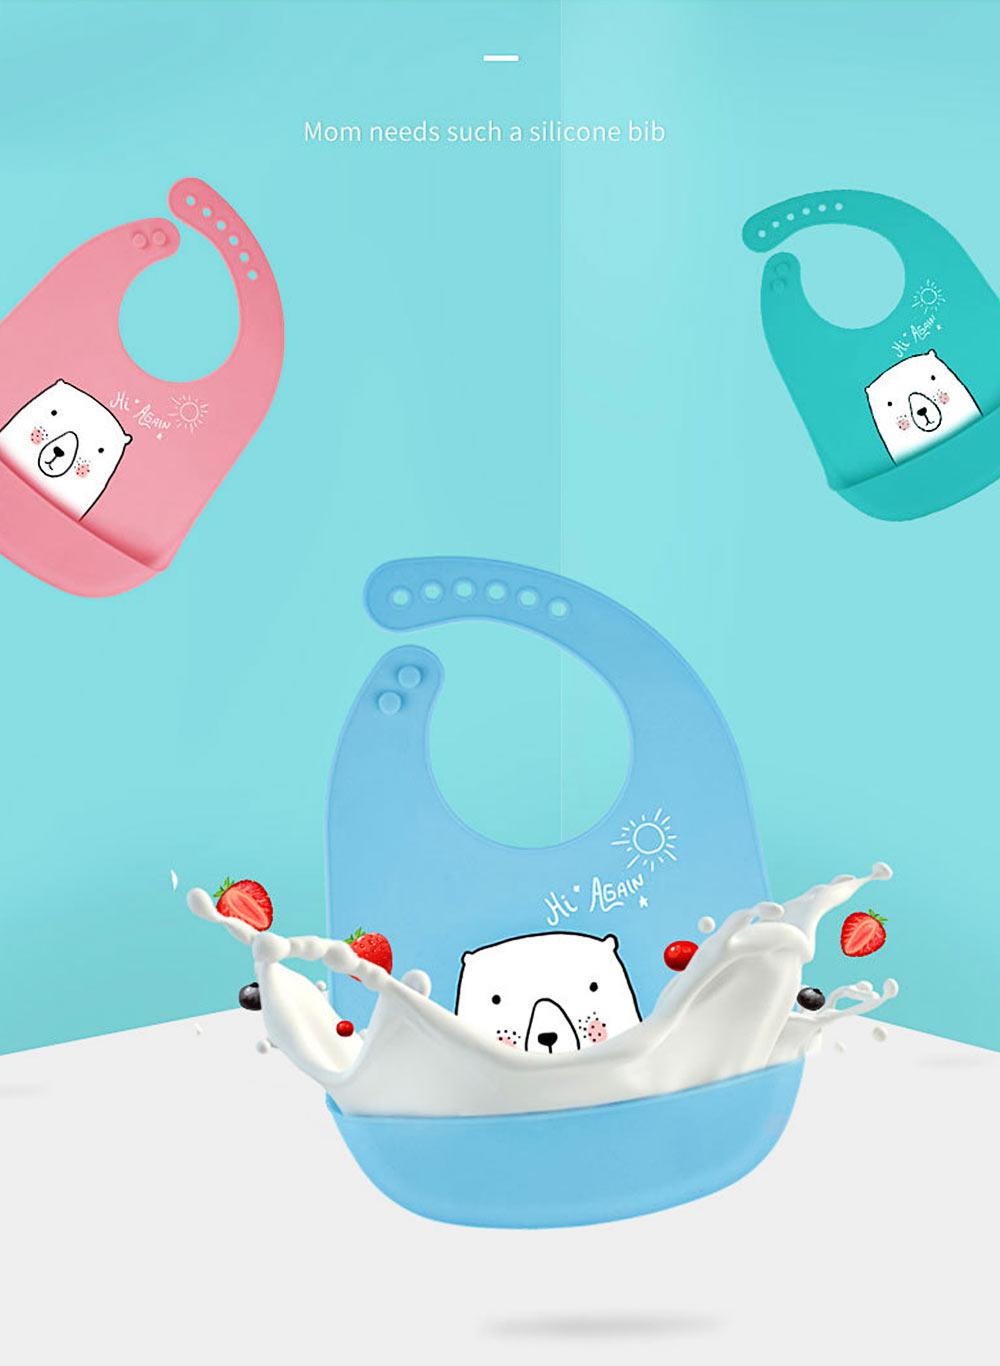 Best Baby Bibs For Eating, Wash-Free Silicone Baby Feeding Bib 1